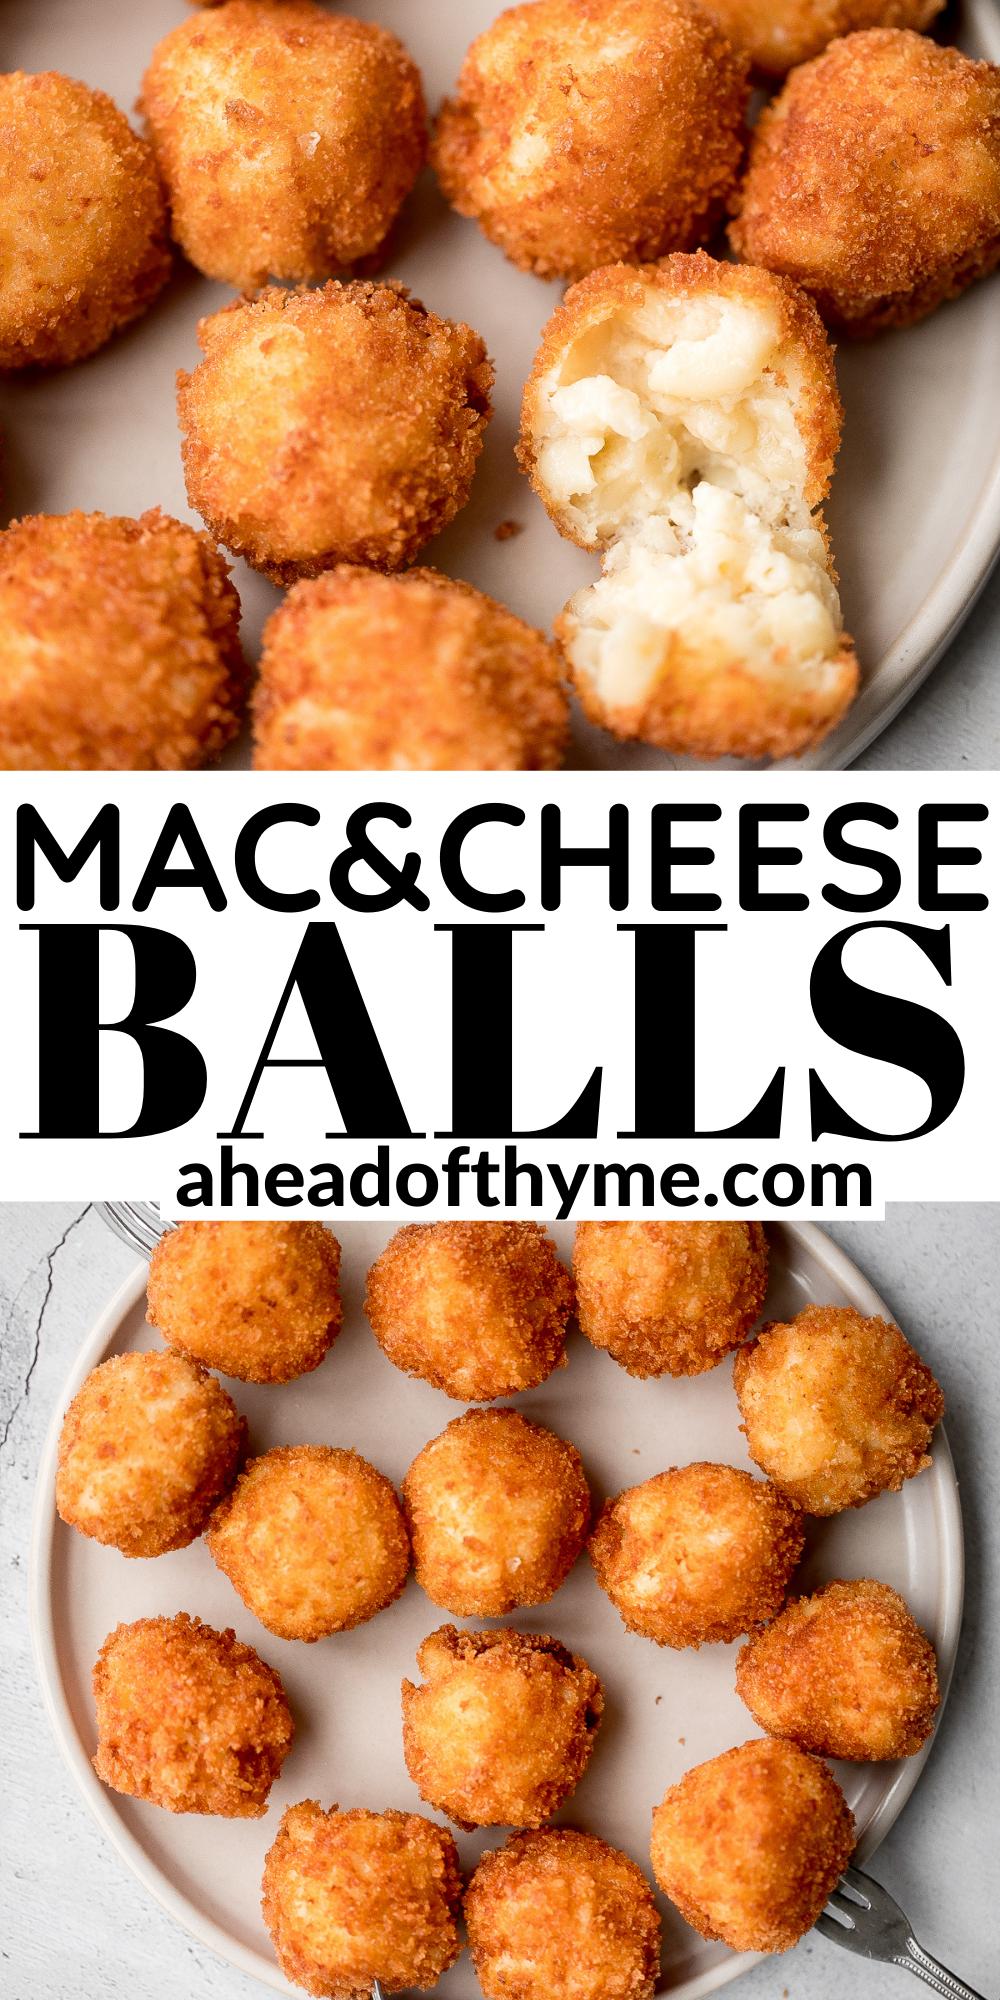 Fried Mac And Cheese Balls Recipe Mac And Cheese Bites Fried Mac And Cheese Mac And Cheese